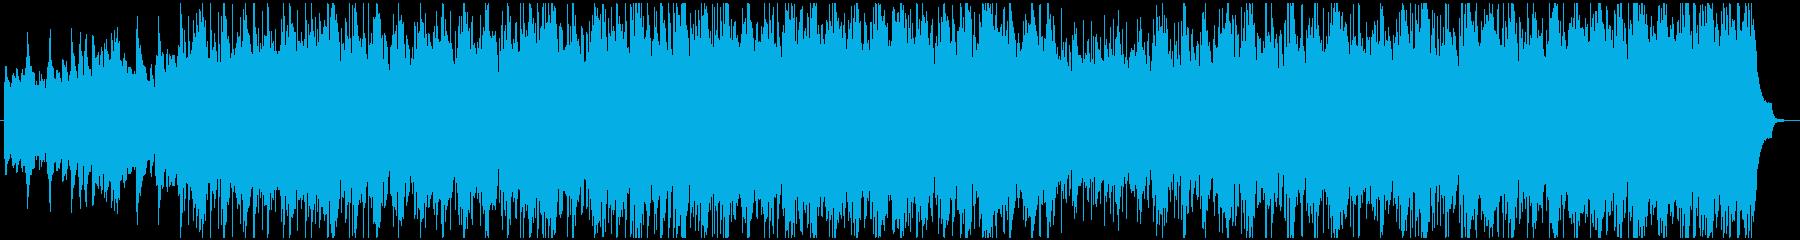 Inspiring Ways's reproduced waveform